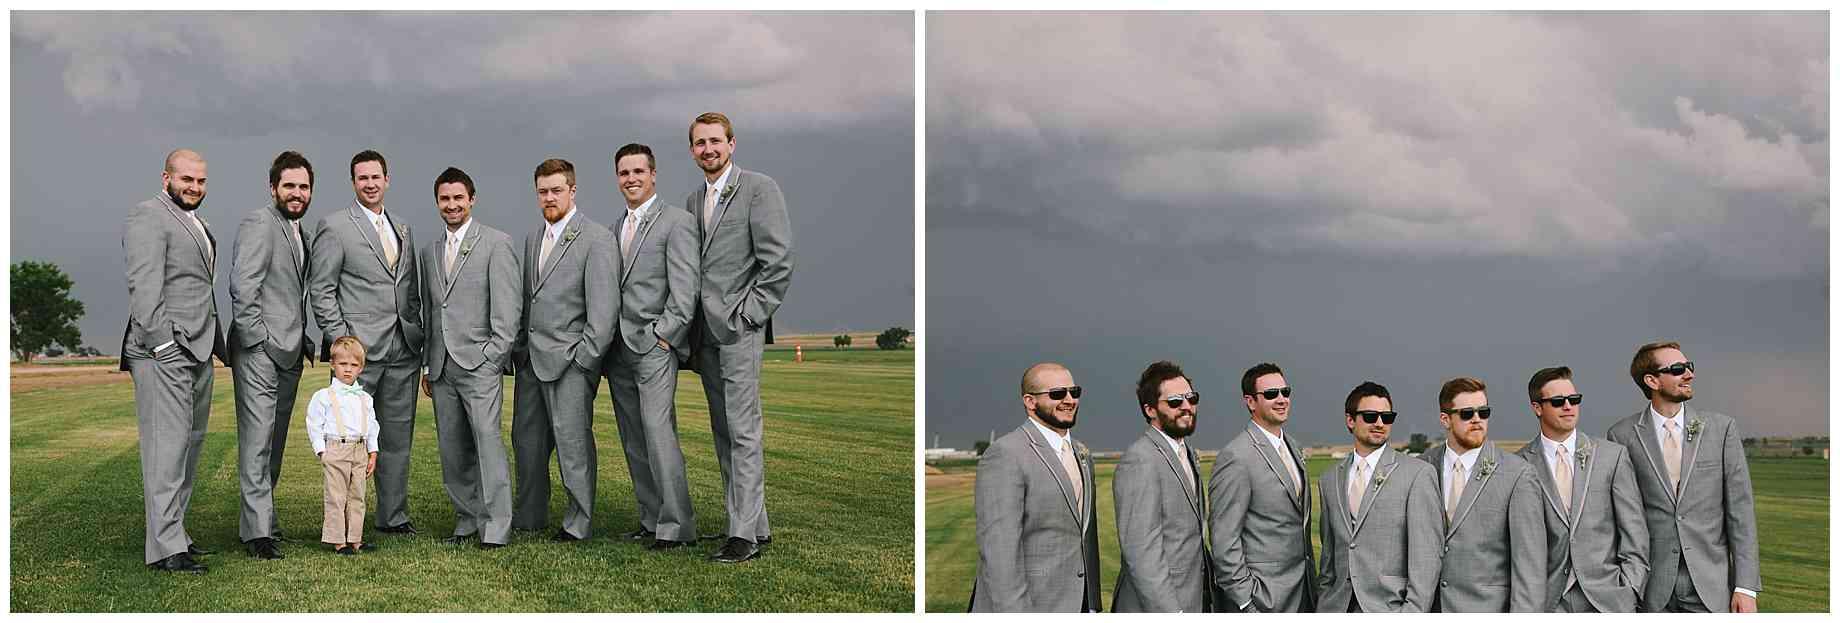 denver-wedding-photography-_0024